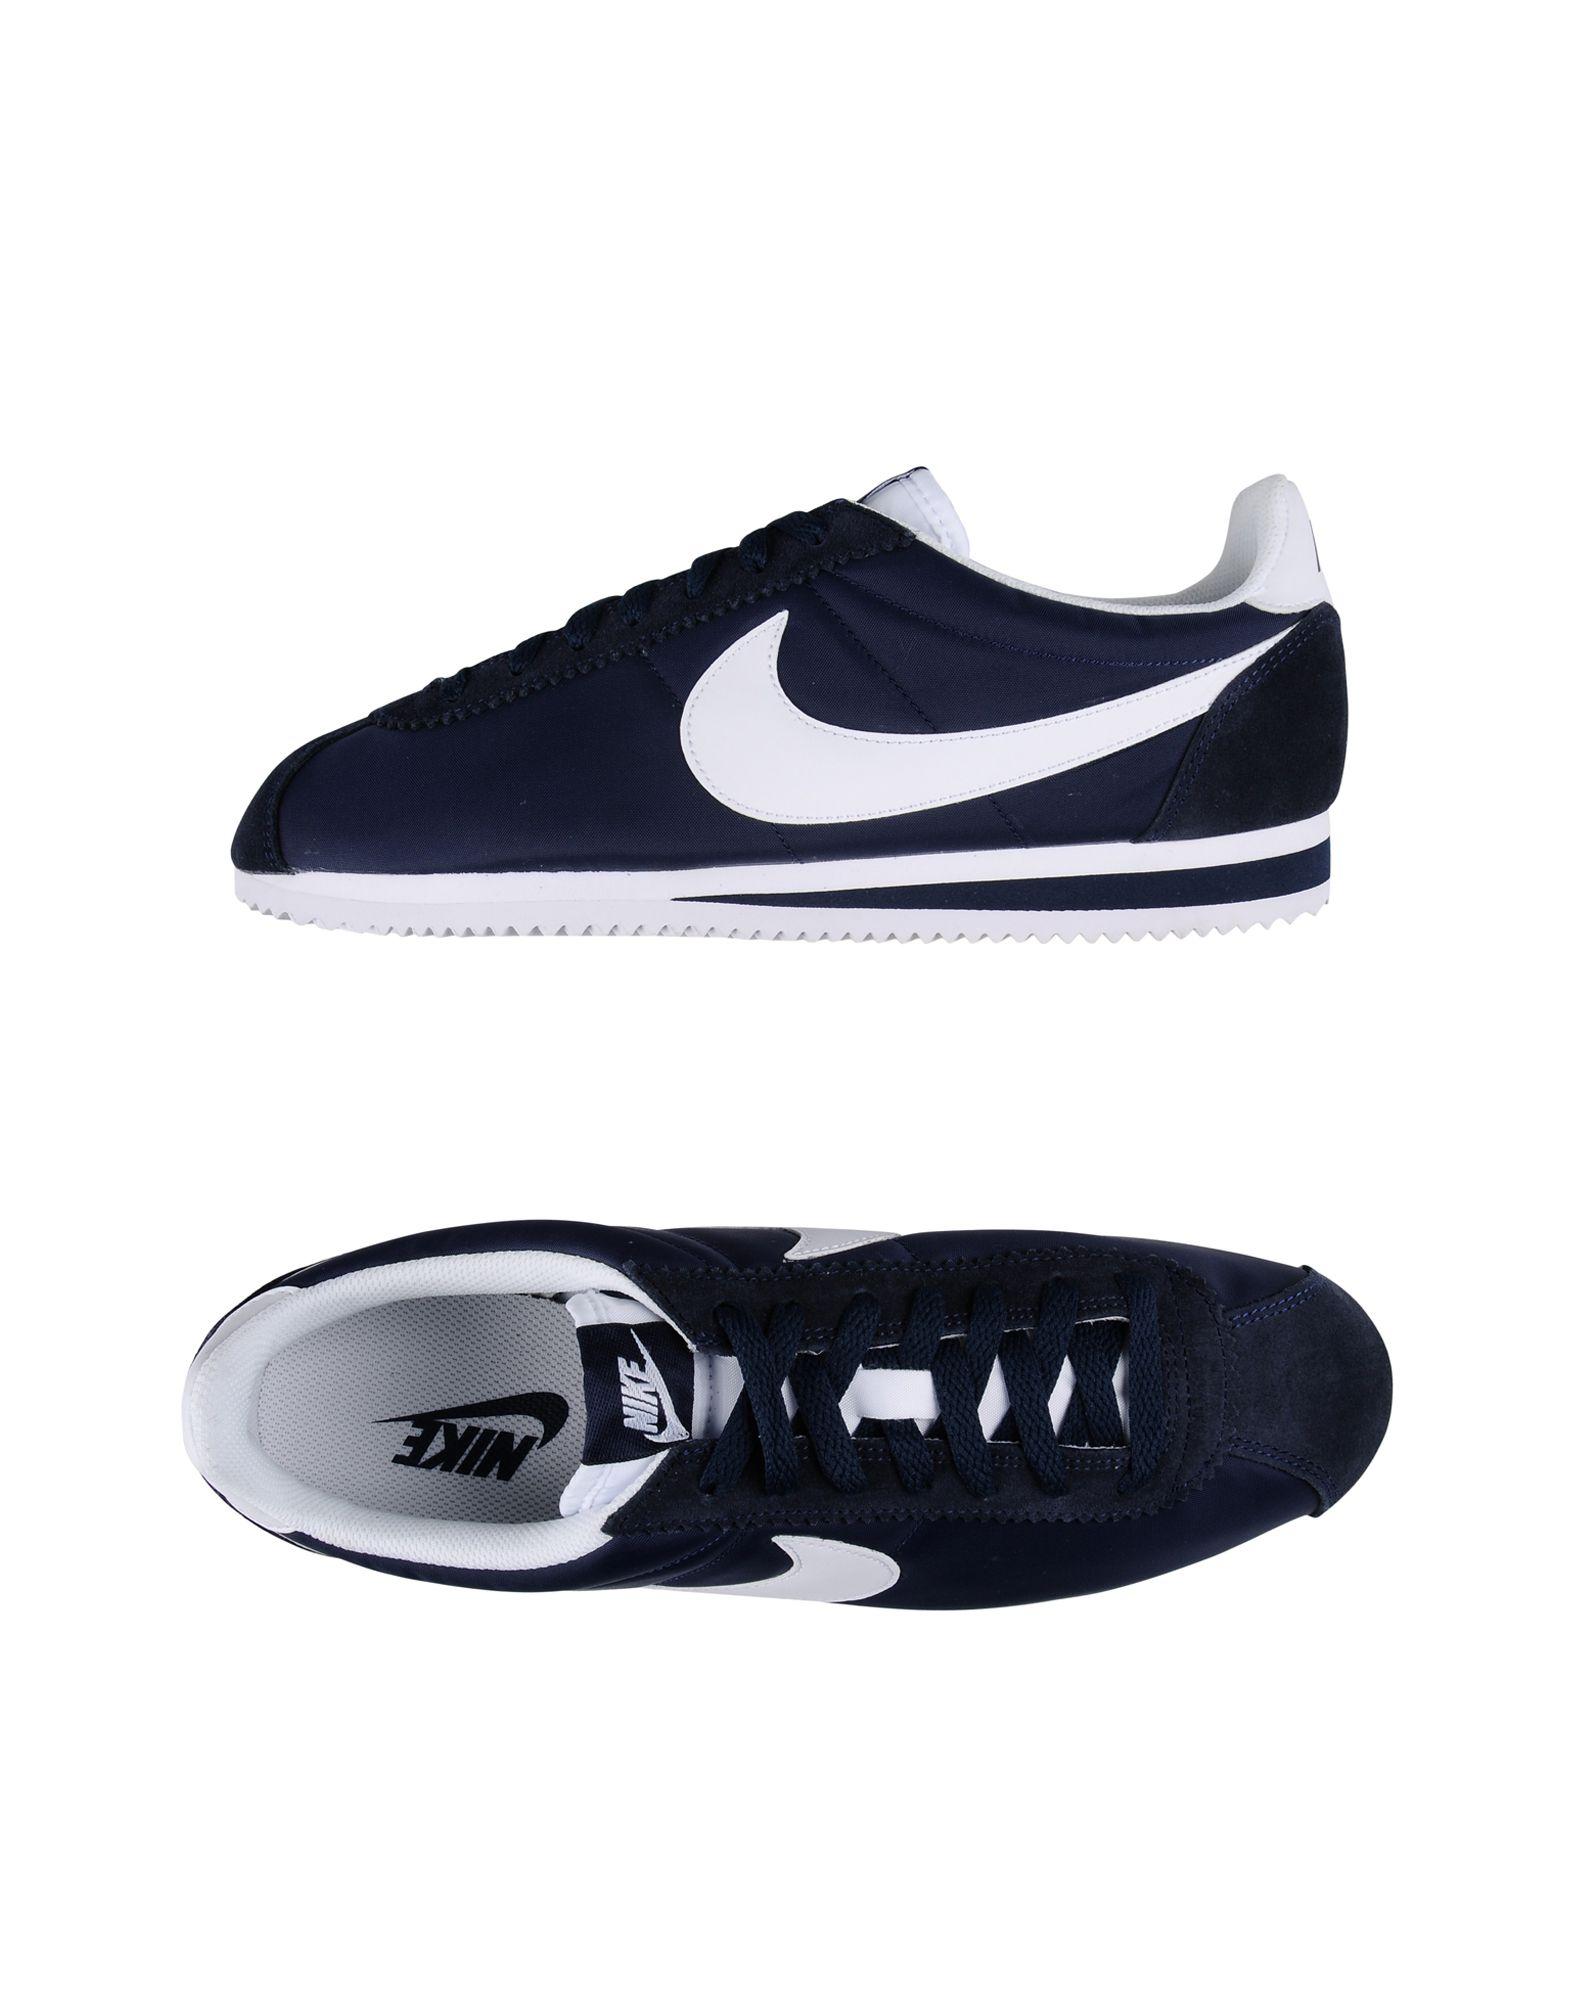 Sneakers Nike Classic Cortez Nylon - Homme - Sneakers Nike sur